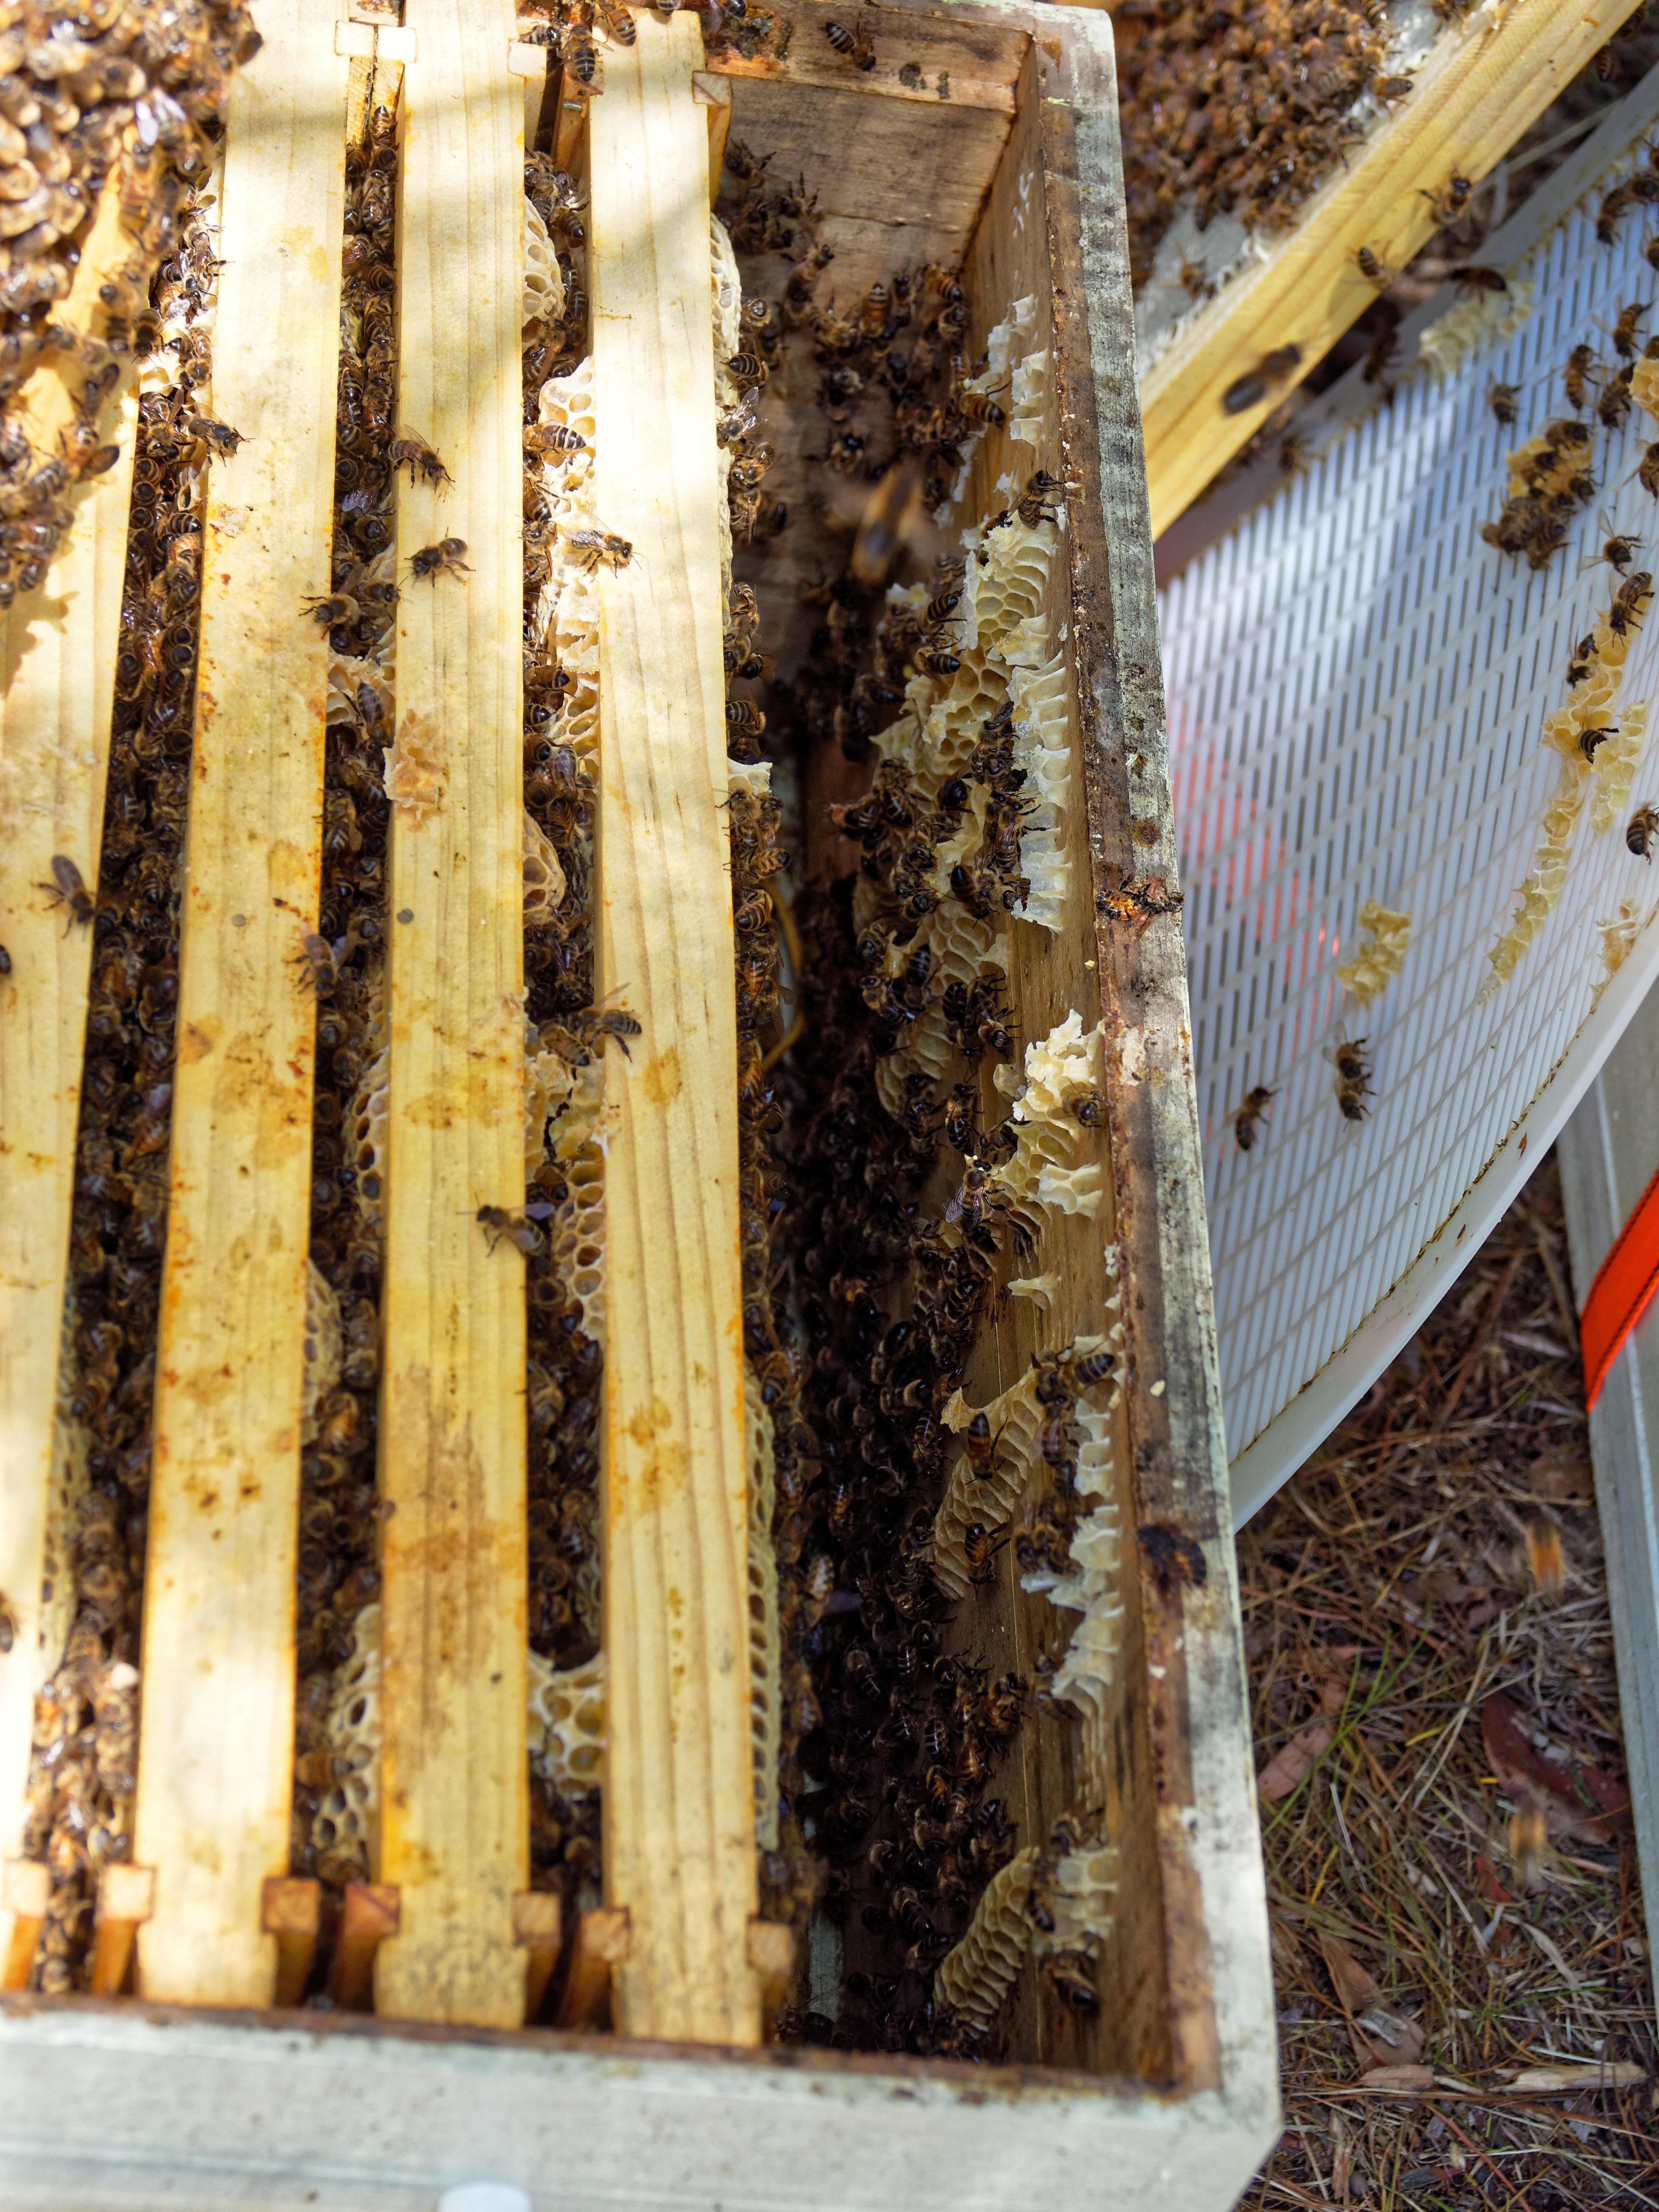 Inspecting-beehives-73.jpeg